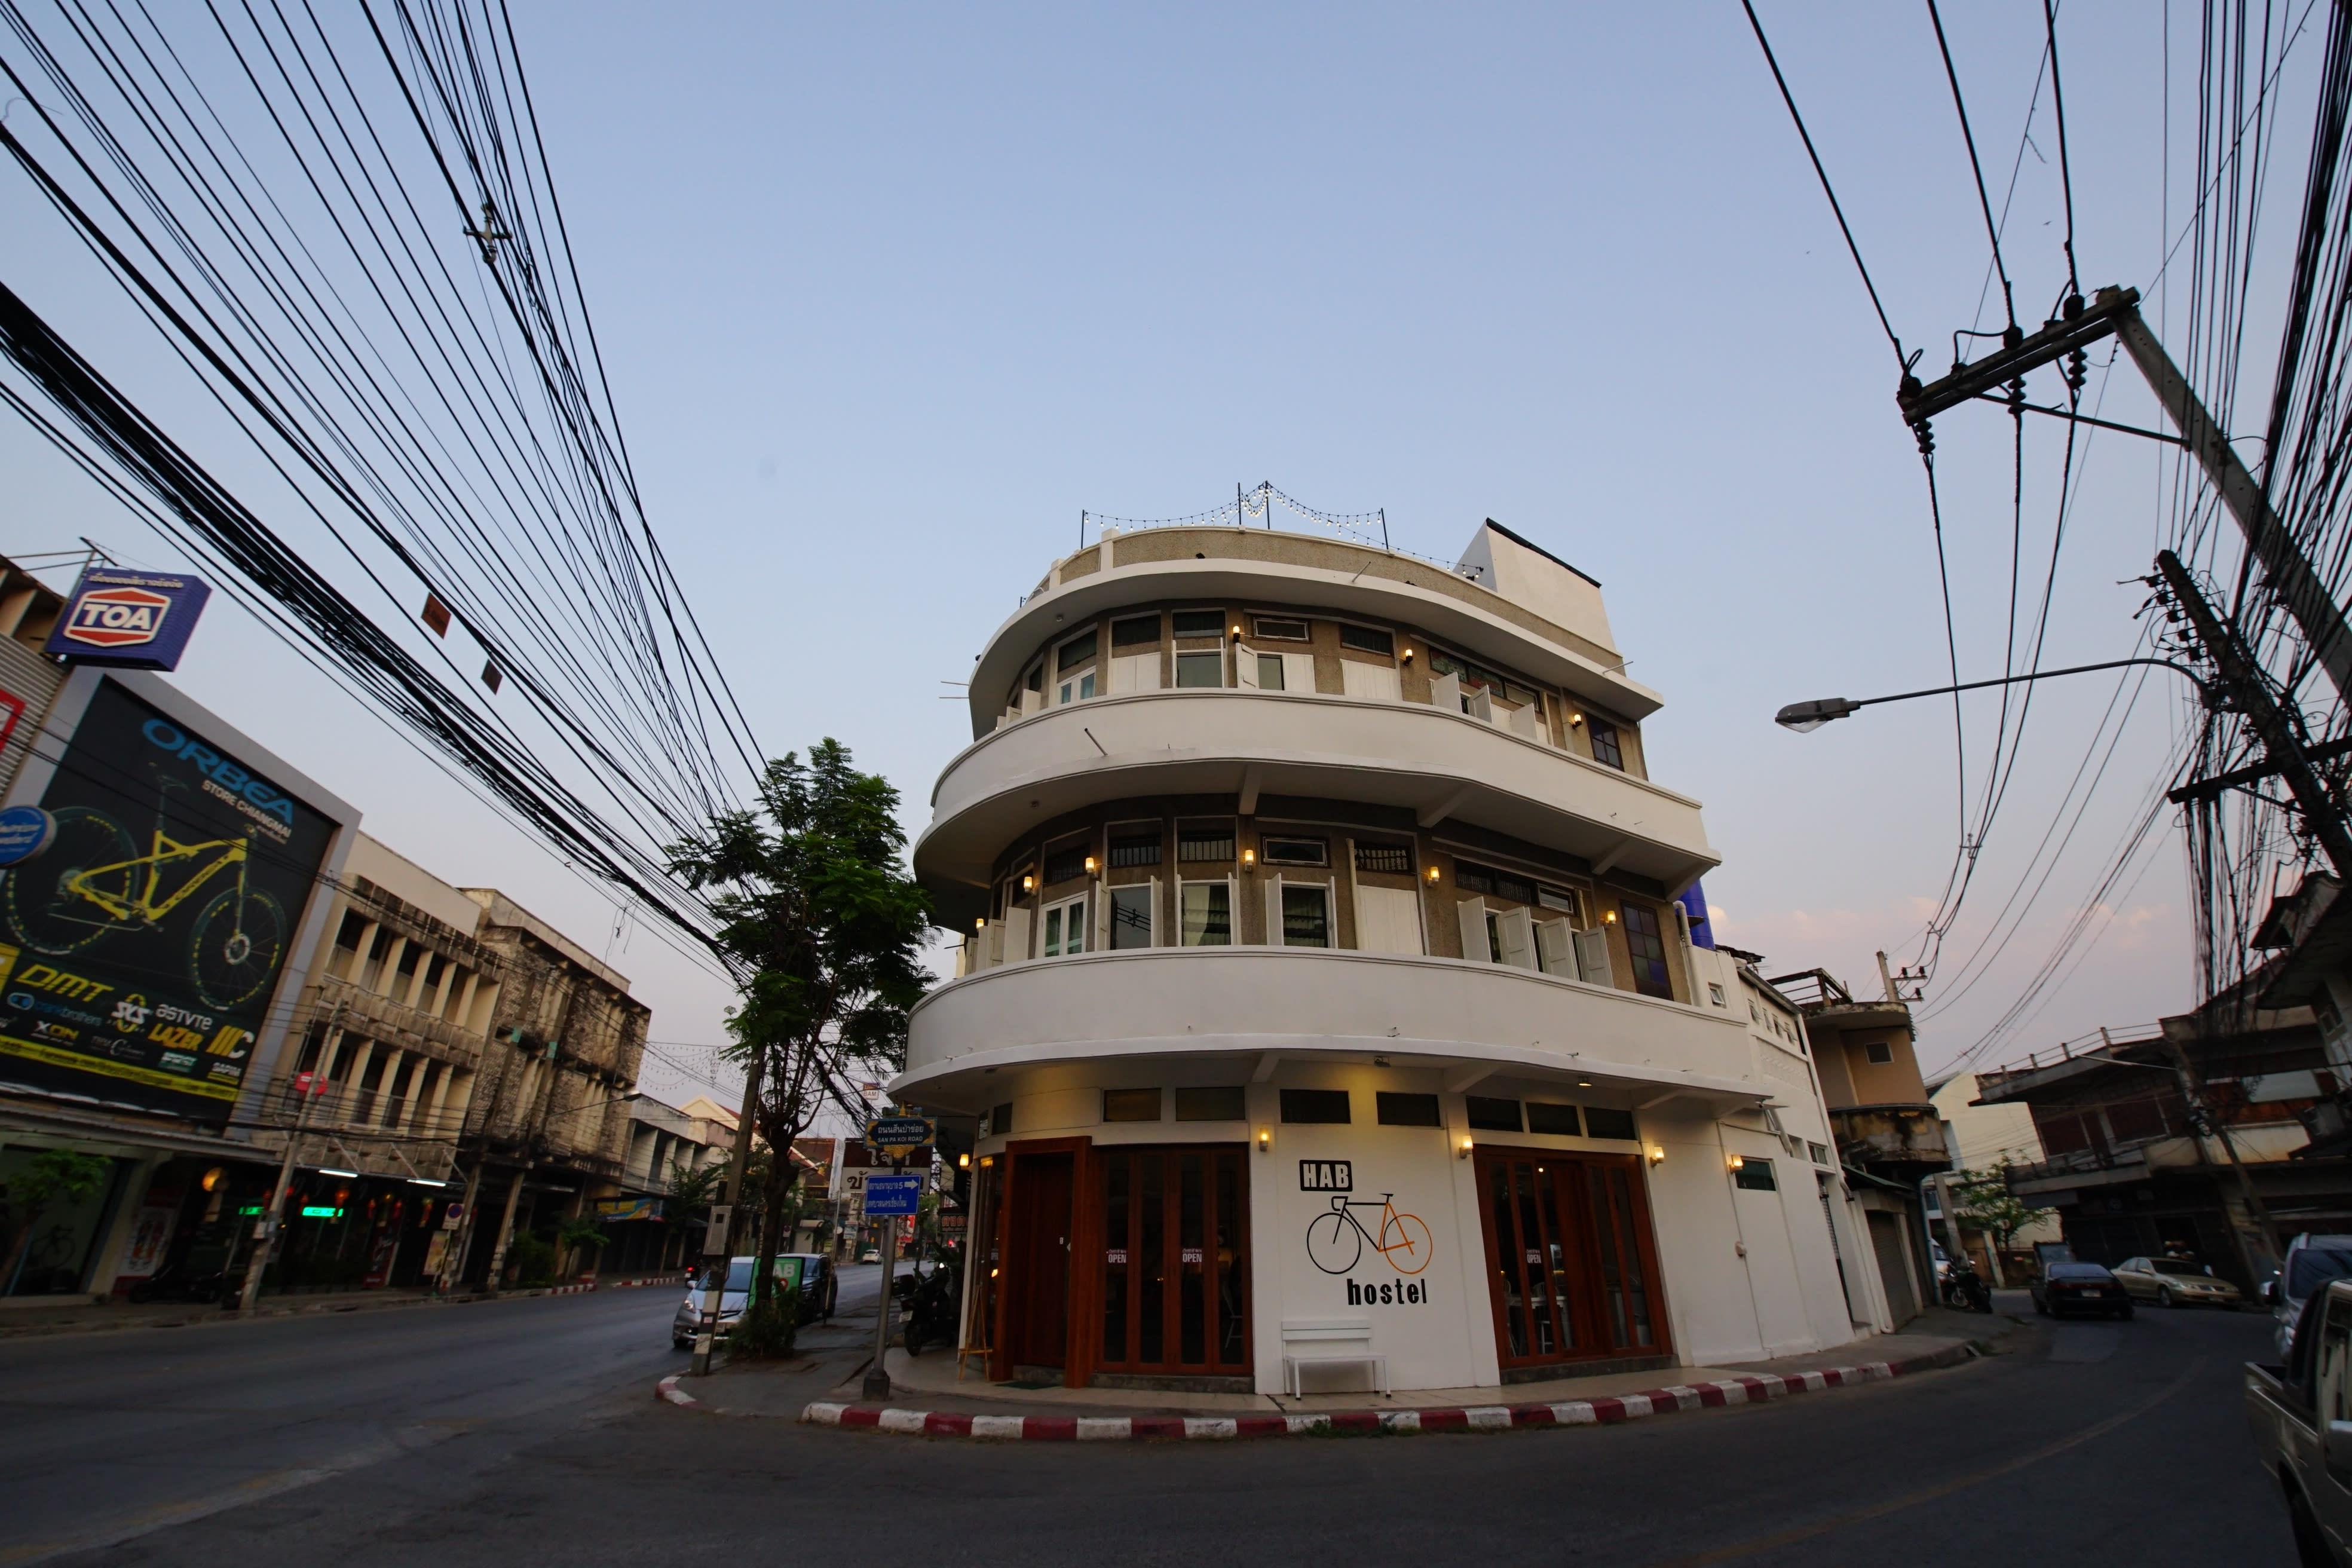 HOSTEL - Hab40 Hostel